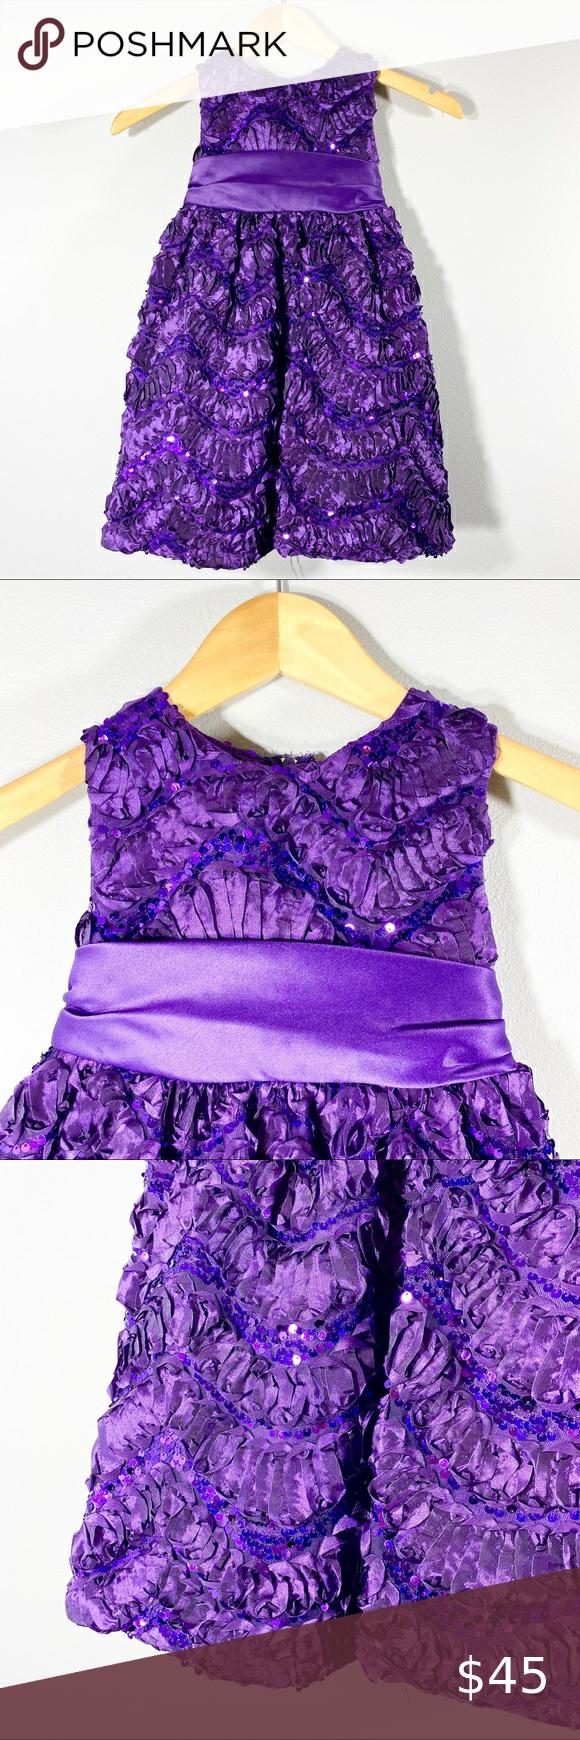 Rare Editions Nwot Purple Girls Ball Gown Sz 4t Girls Ball Gown Rare Editions Dress Ball Gowns [ 1740 x 580 Pixel ]